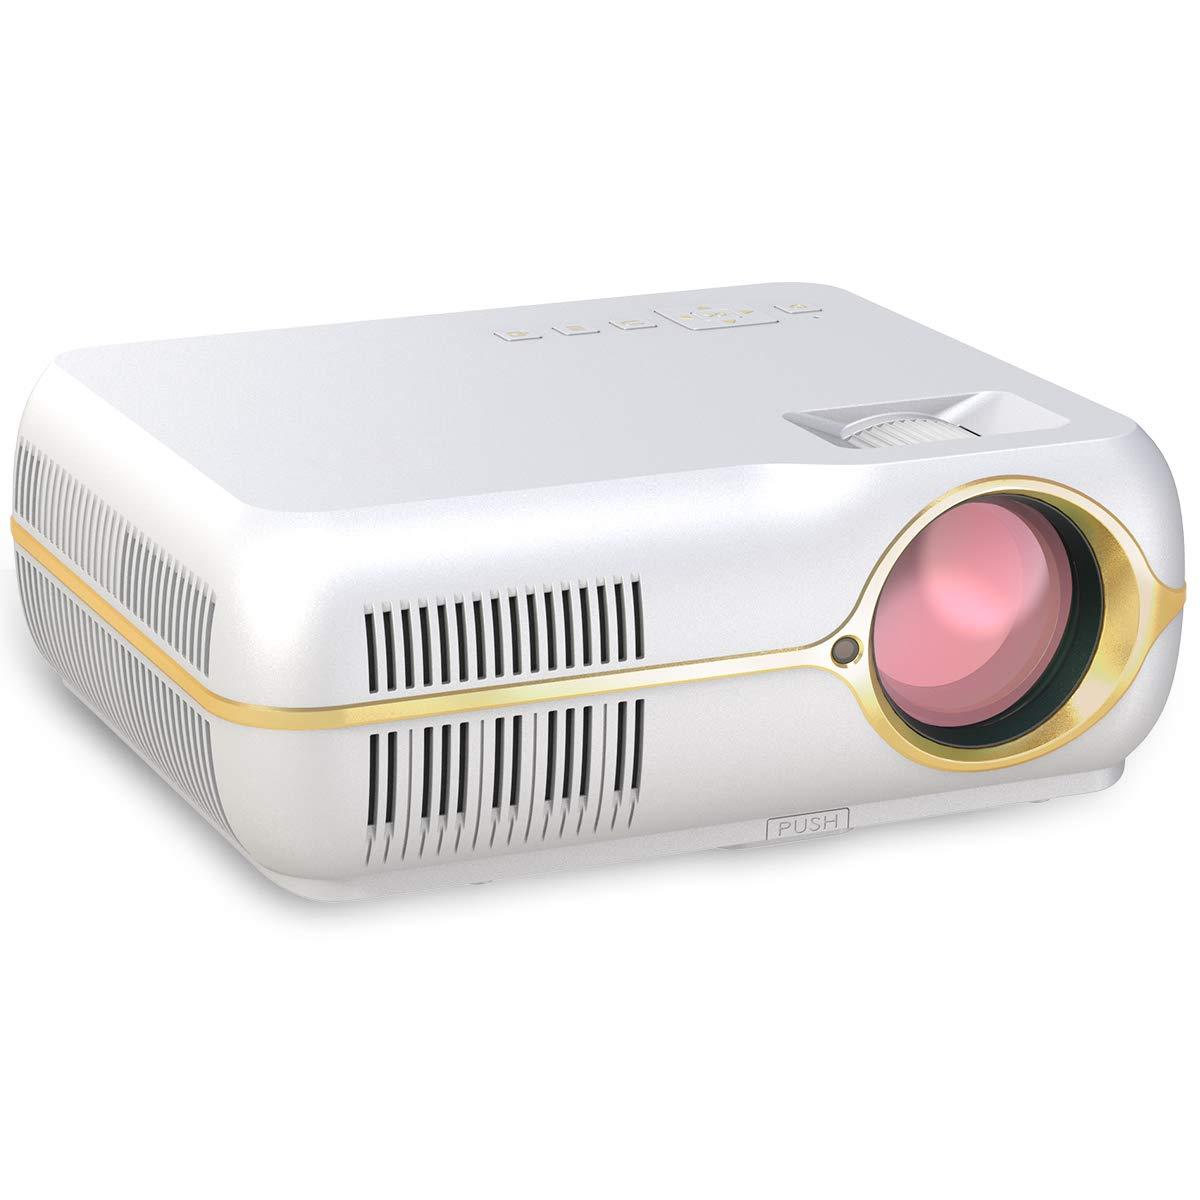 c0671d70ee74 Mini Projector - Upgraded Projector +50% Lumens LED Full HD Mini Portable  Projector 120